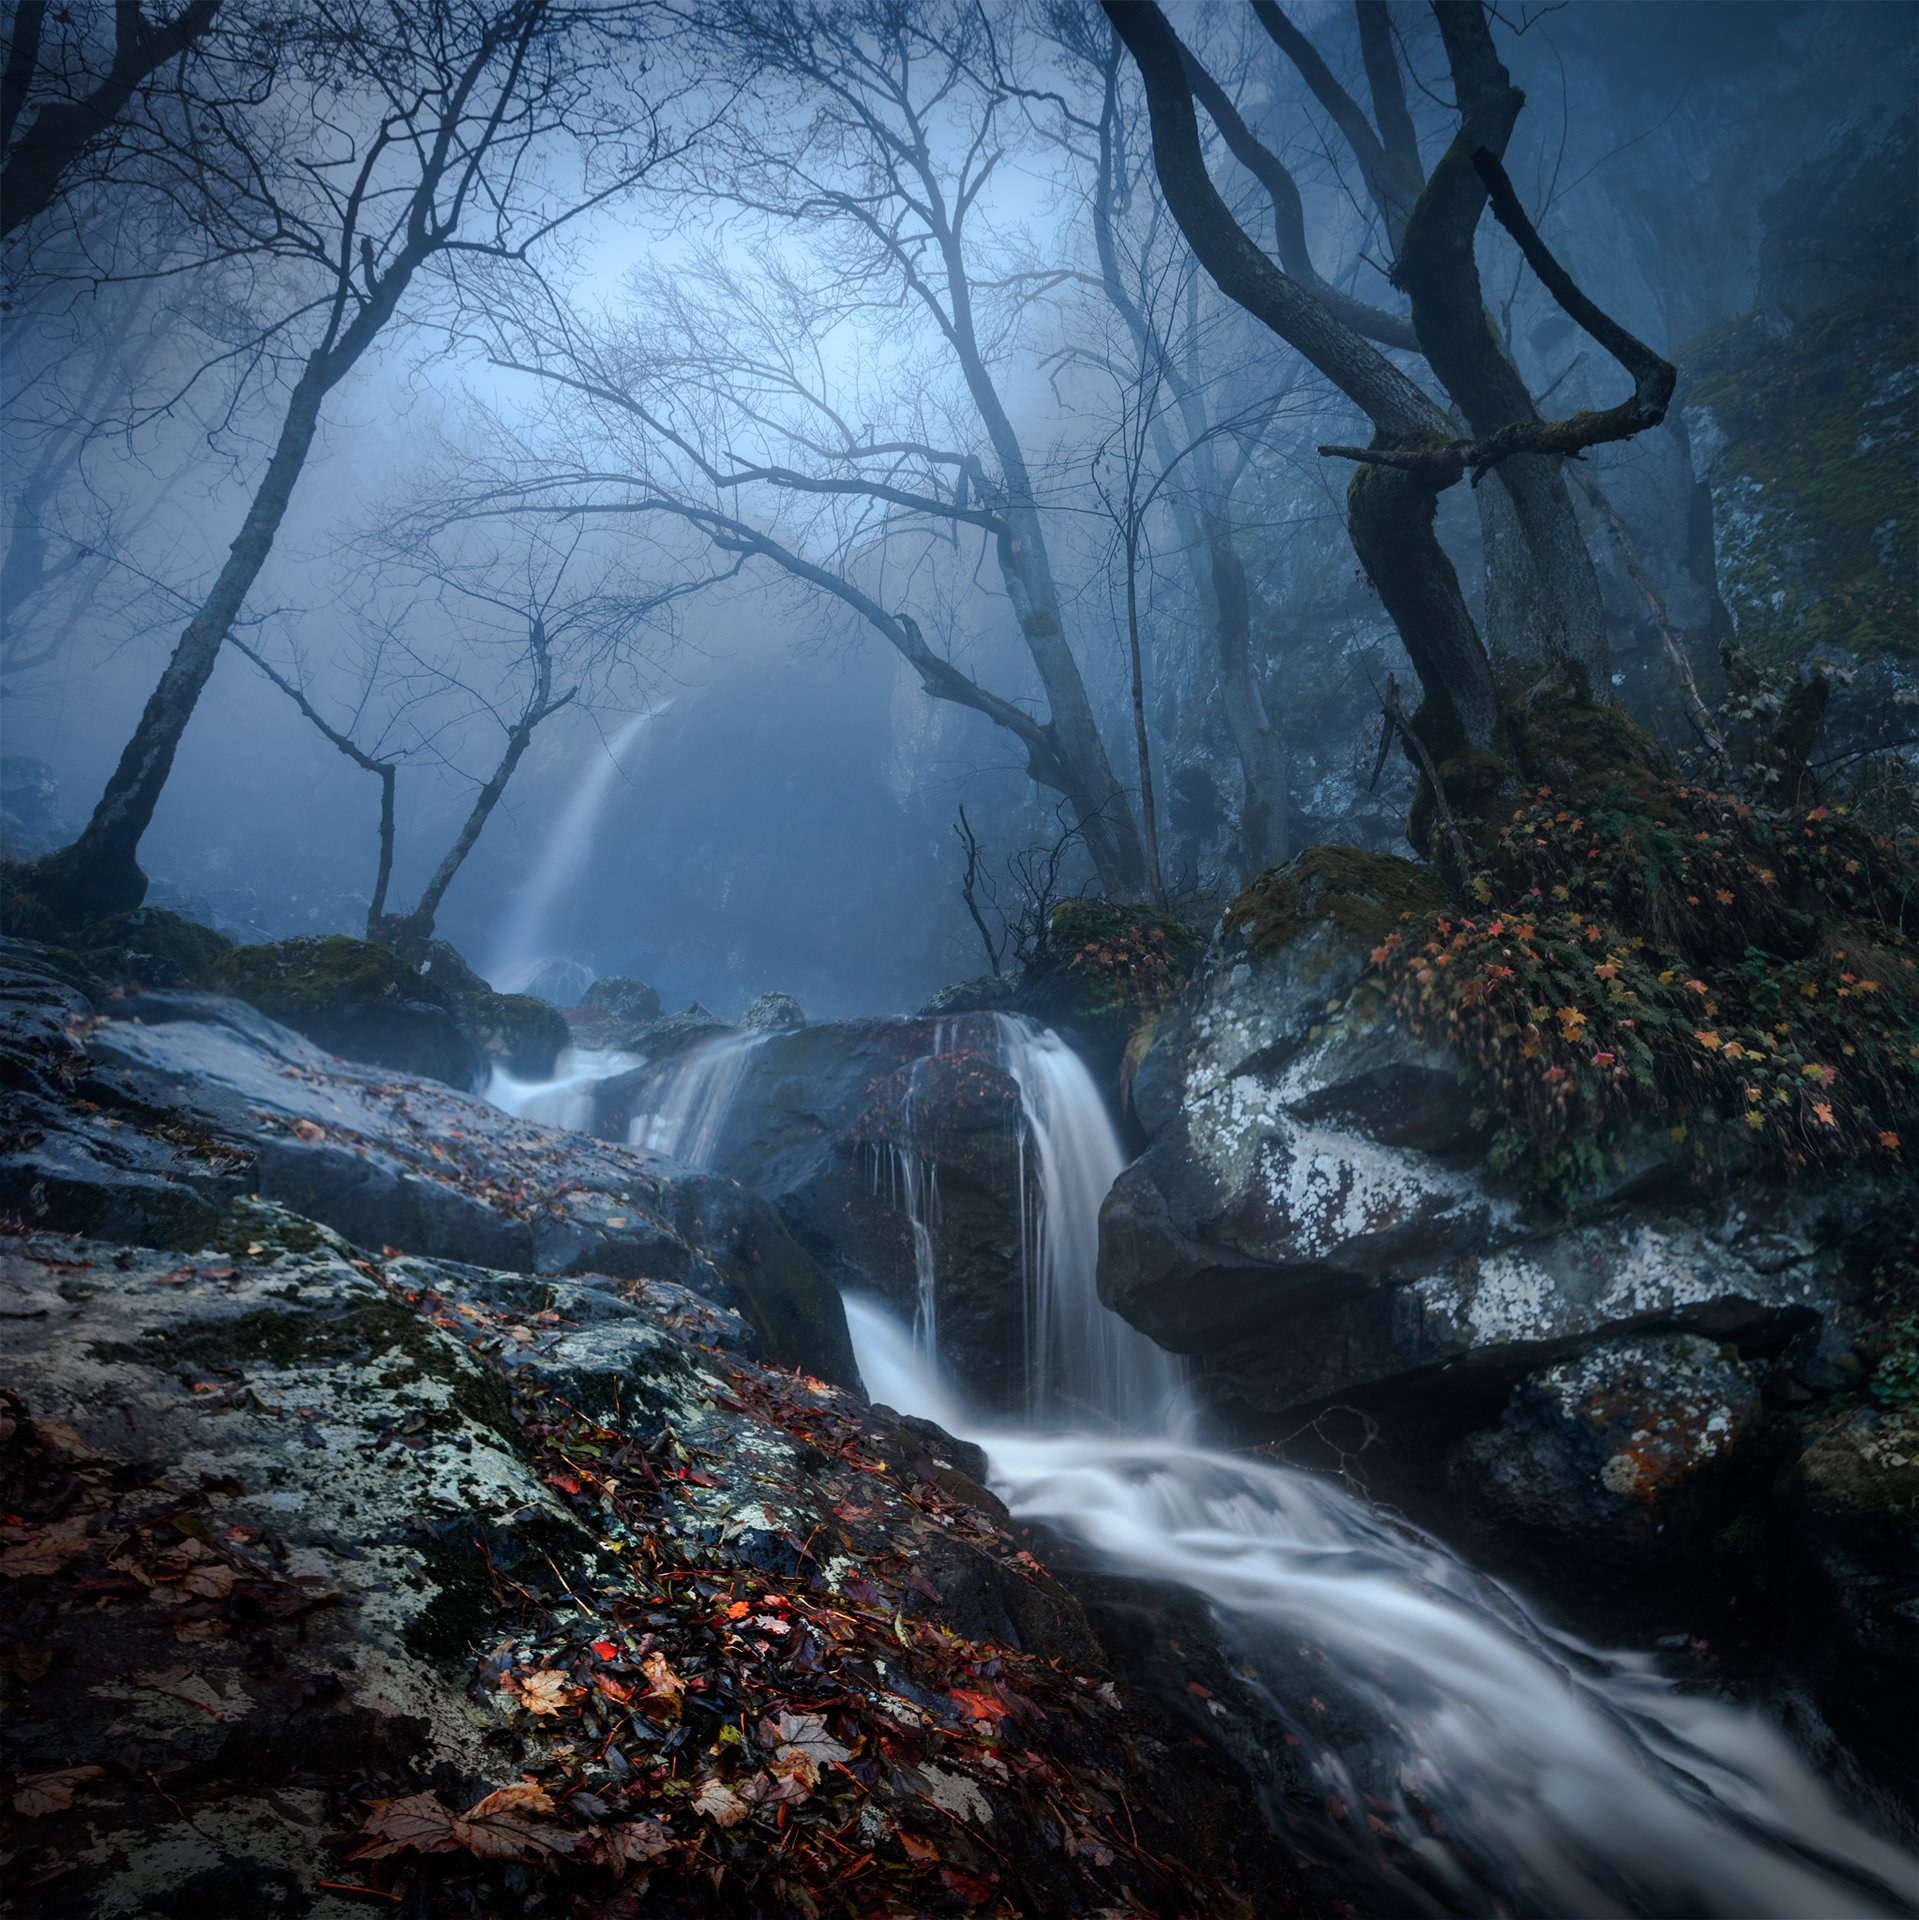 landscape, nature, scenery, forest, wood, mist, misty, fog, foggy, waterfall, fall, autumn, mountain, vitosha, bulgaria, туман, лес, Александър Александров